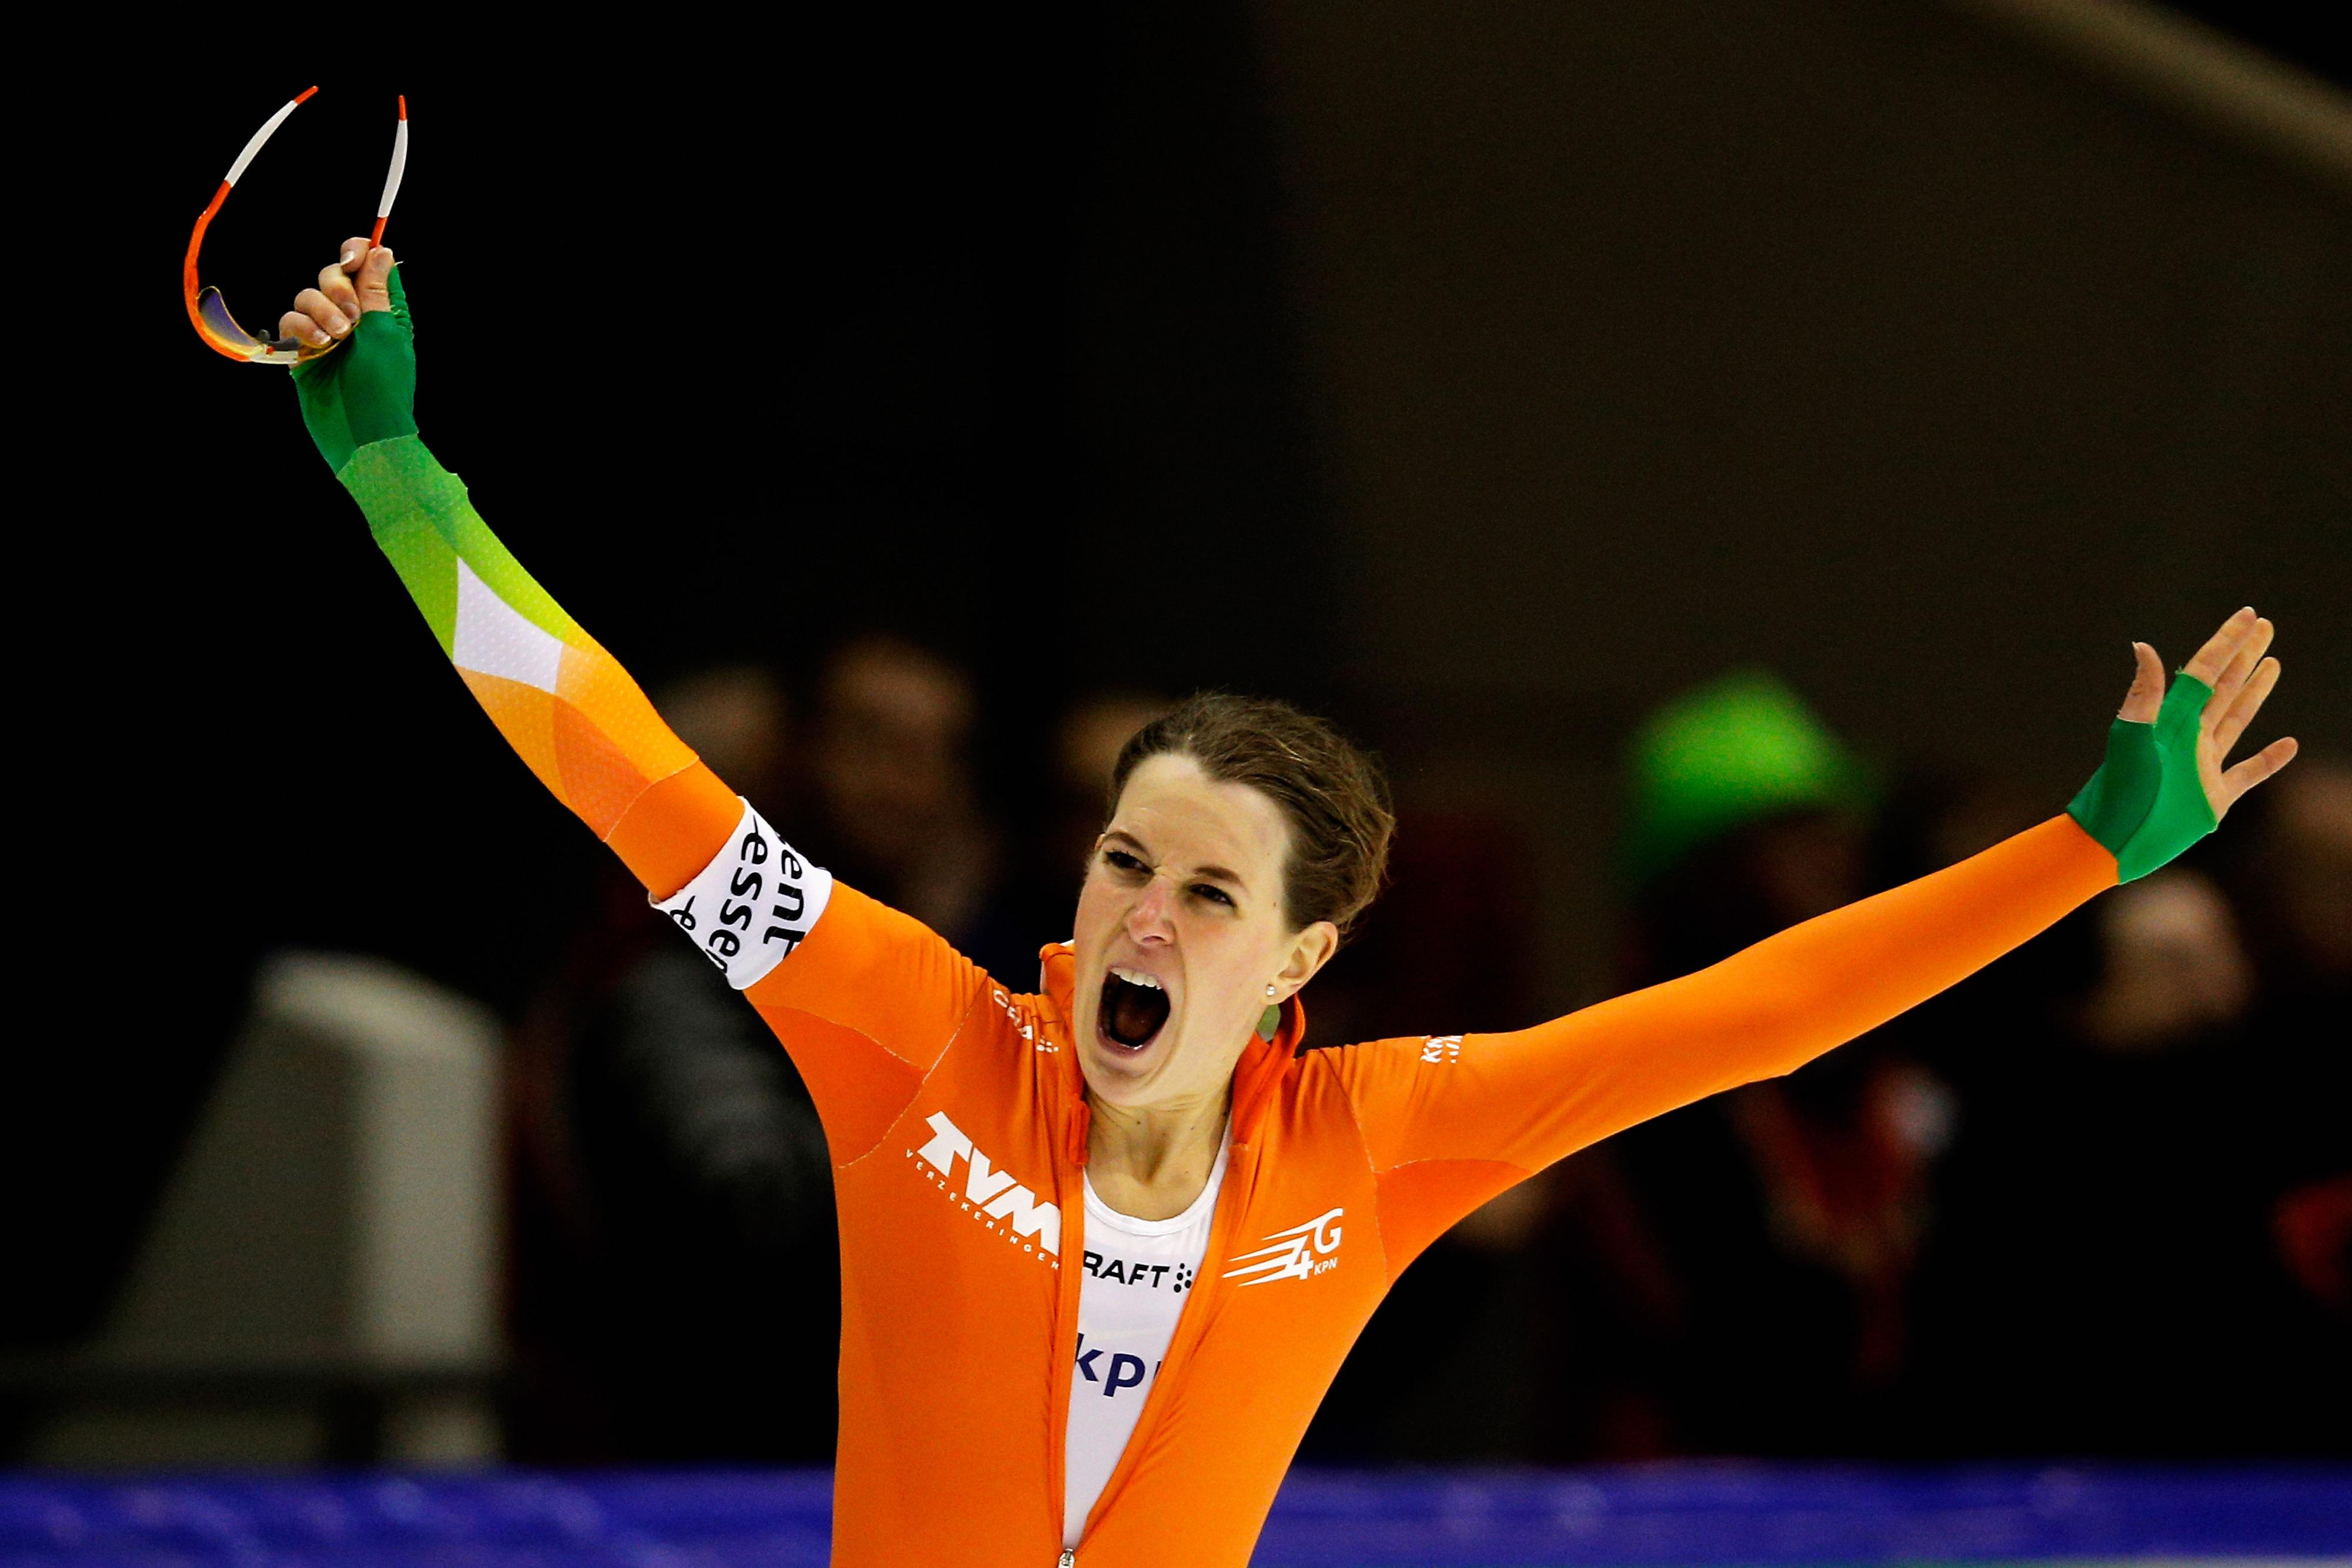 Dutch speedskater Ireen Wüst has won gold at the last two Olympics.